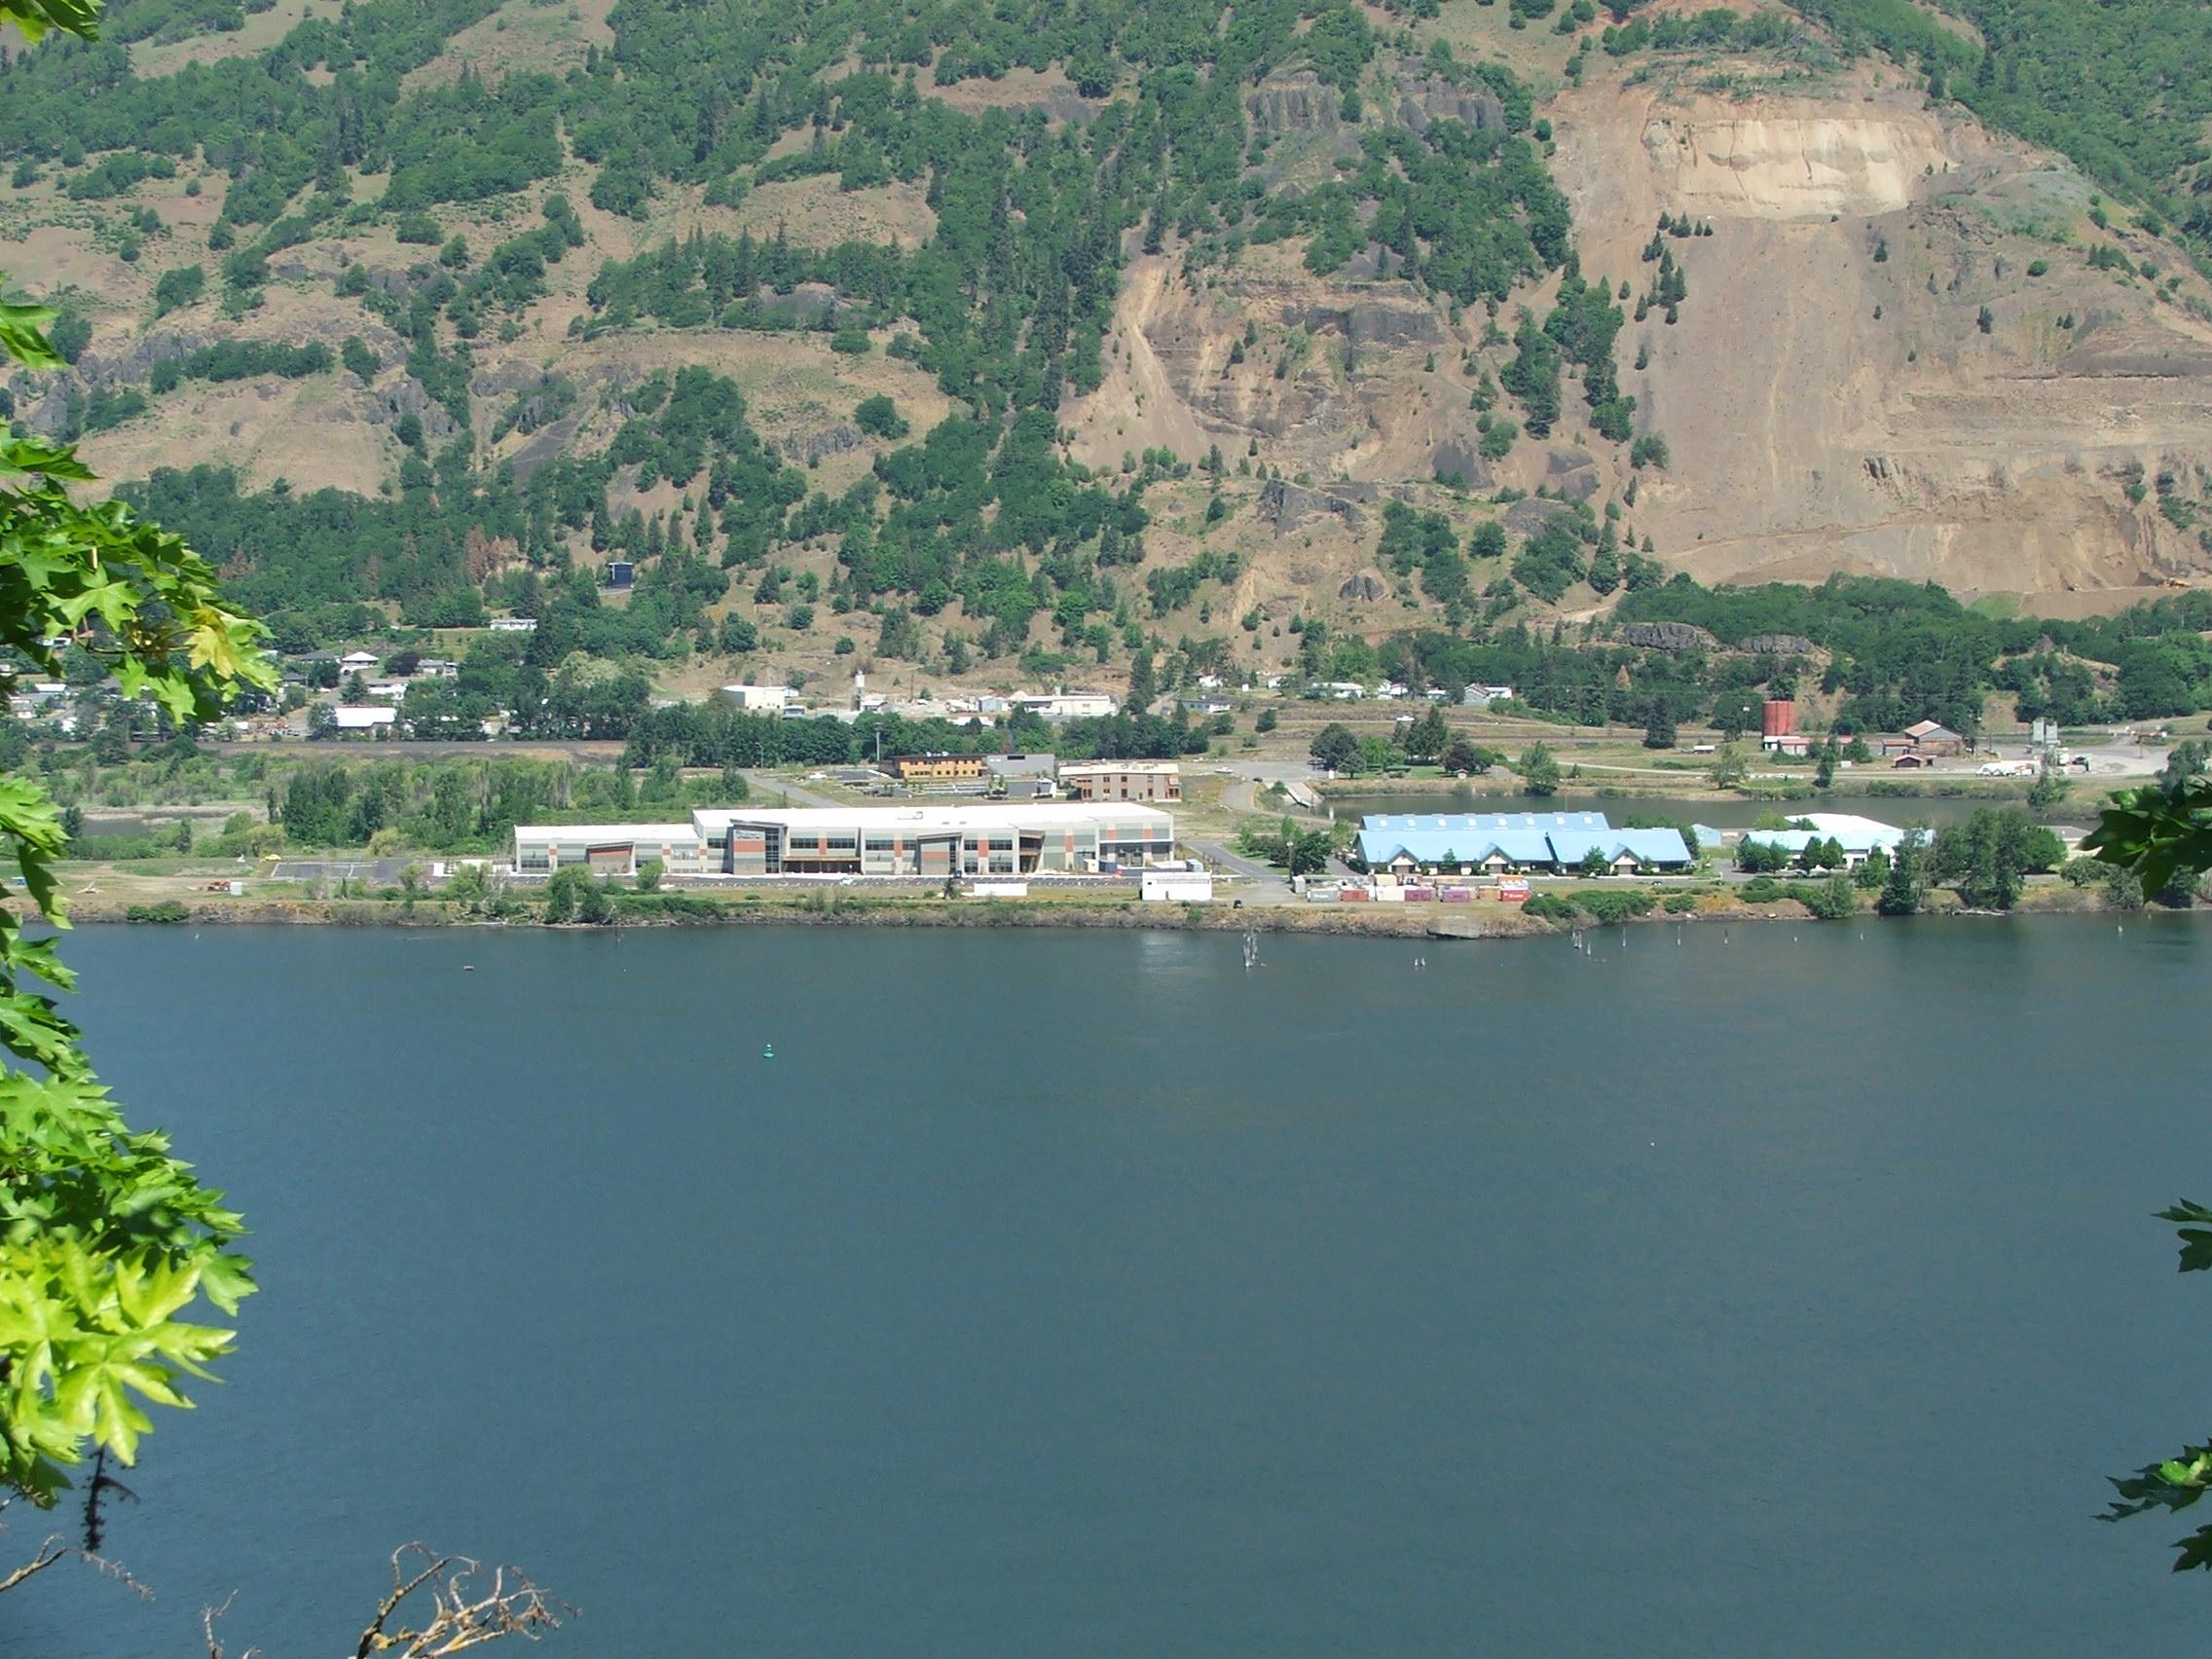 Port of Klickitat